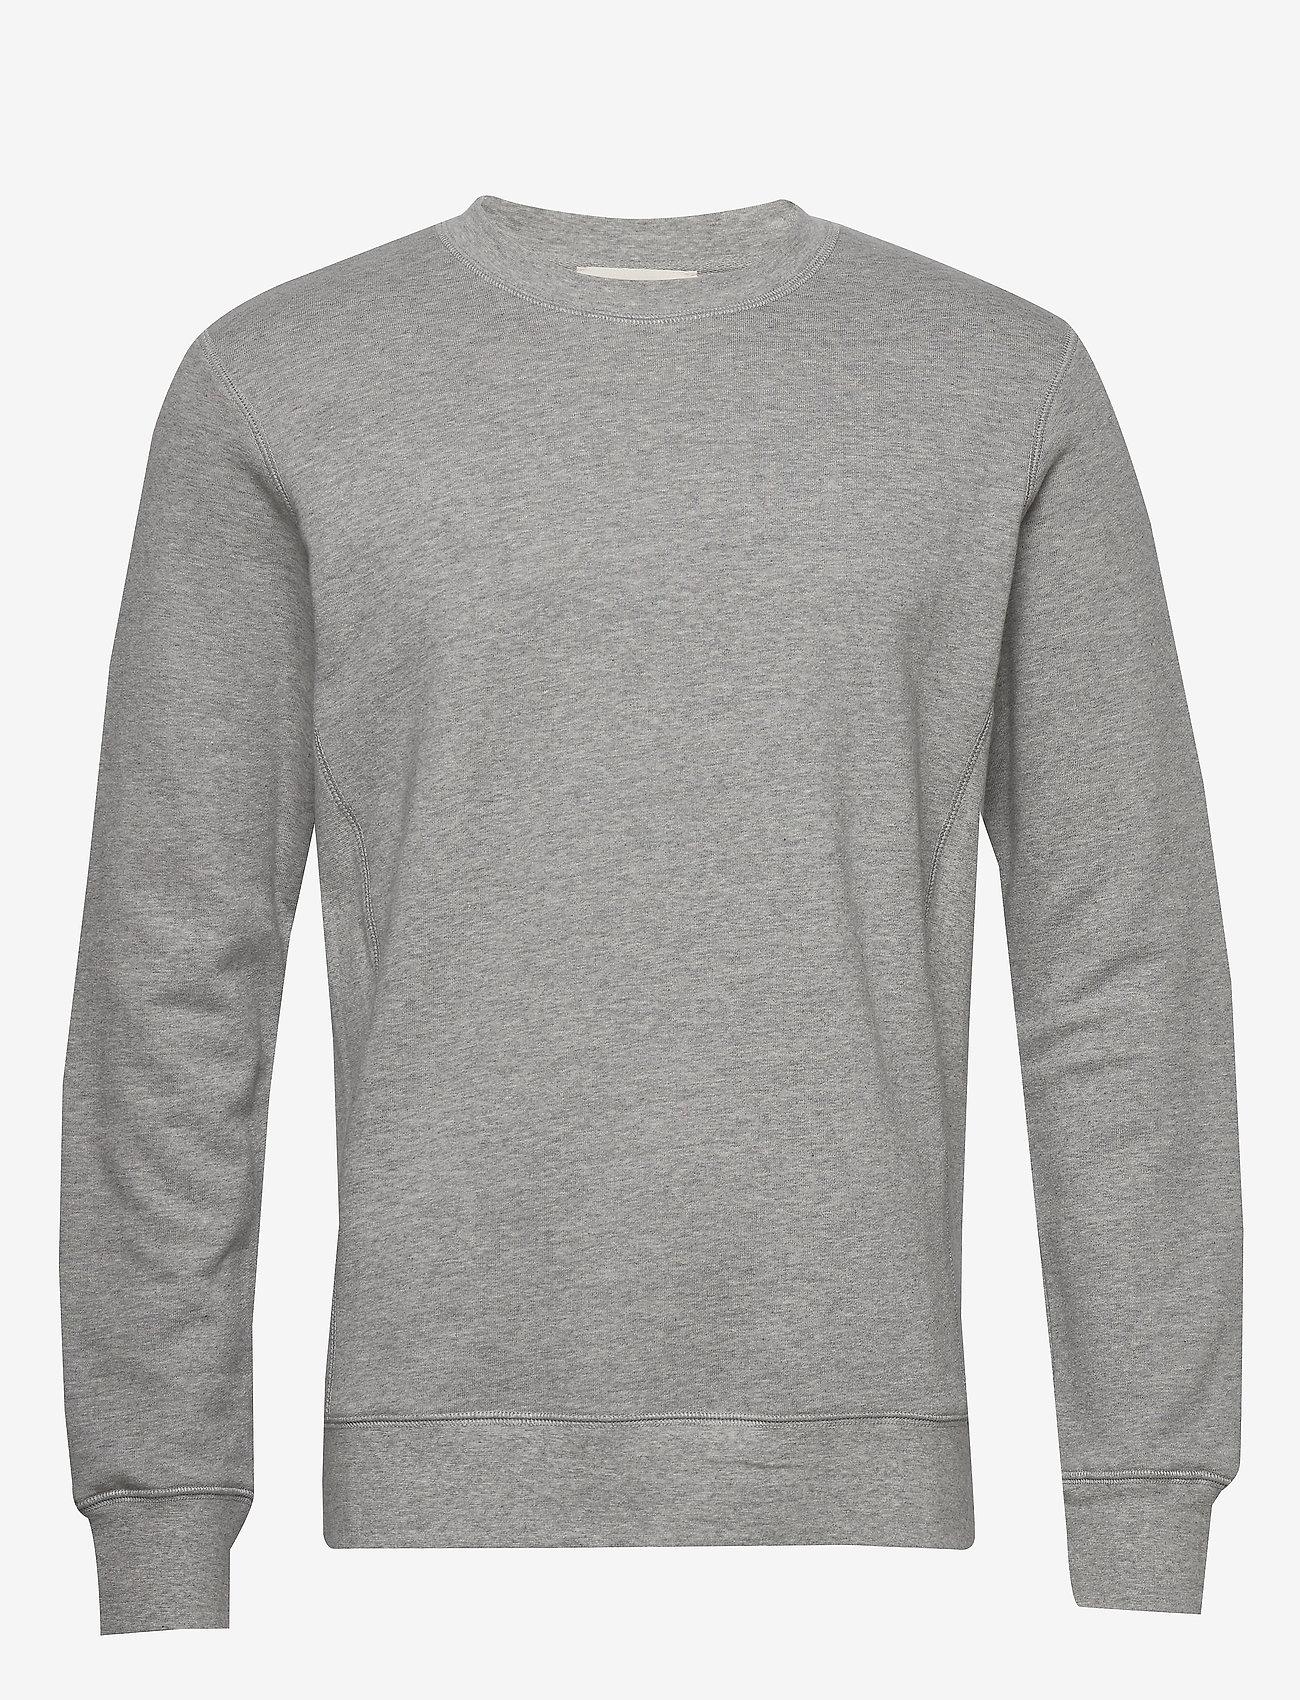 By Garment Makers The Organic Sweatshirt - Sweatshirts LIGHT GREY - Menn Klær